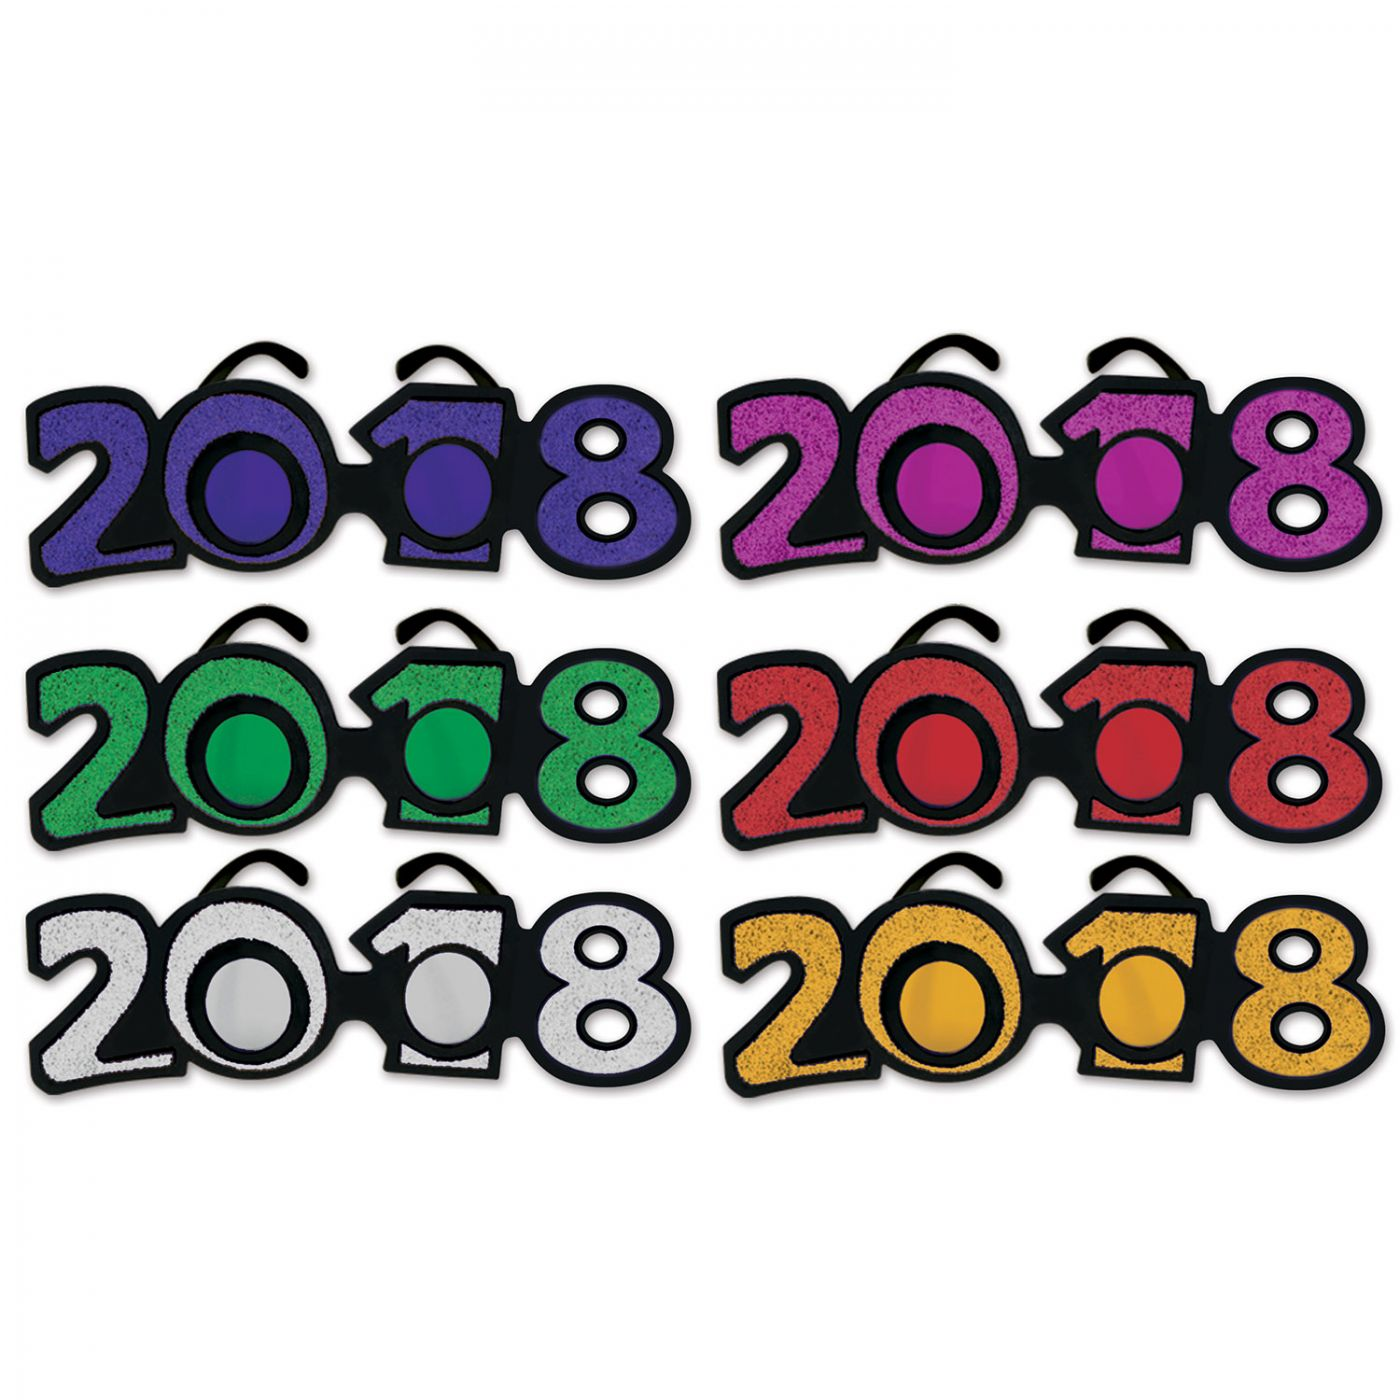 Image of  2018  Glittered Plastic Eyeglasses